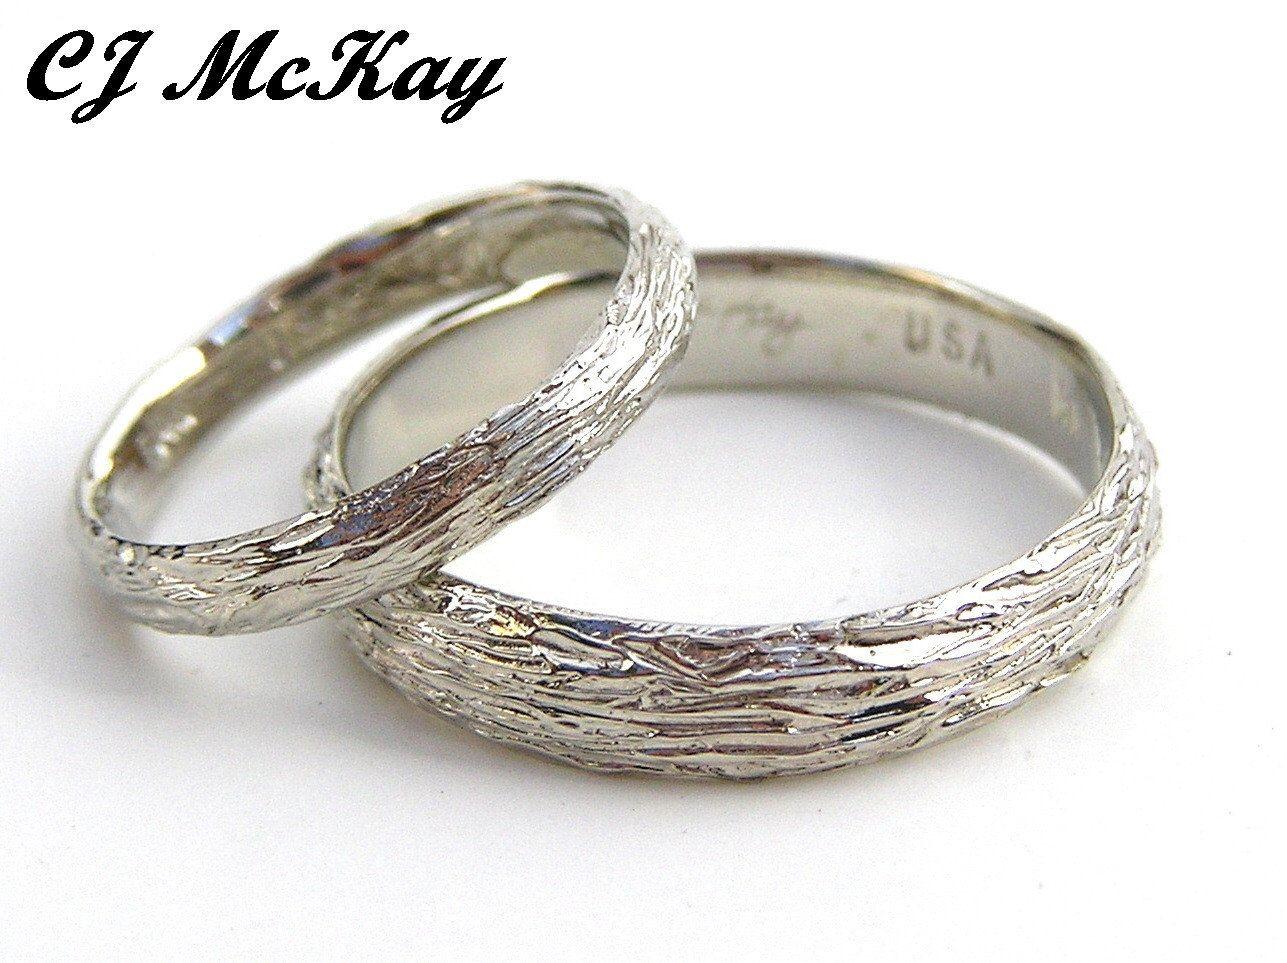 14k white gold wedding ring set tree bark design cr85qset   jewelry